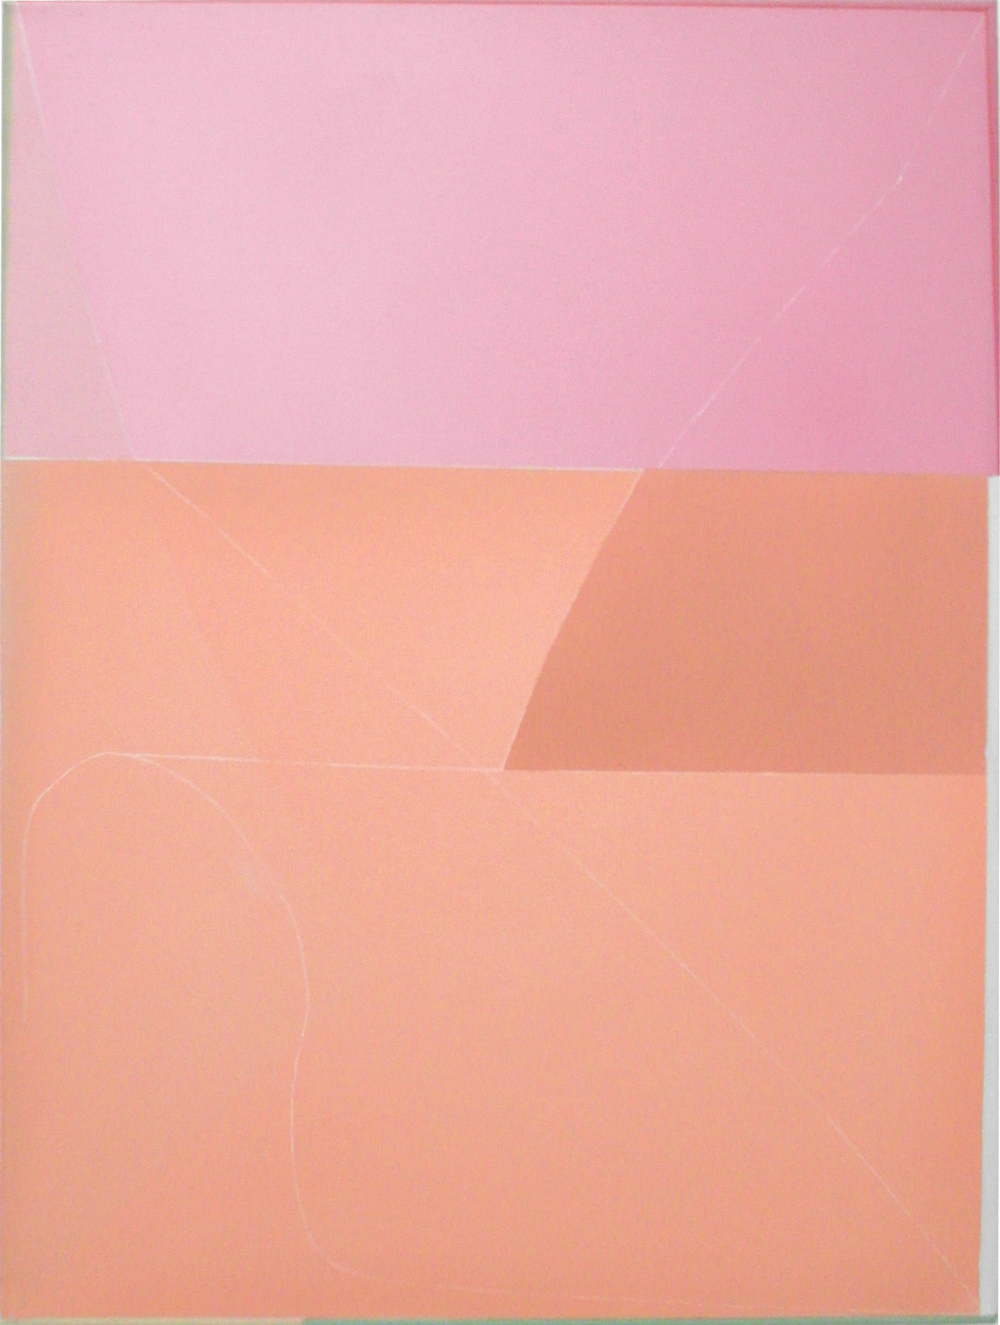 Daniel Hörner, o.T., 70 x 51 cm, Öl auf Leinwand, 2014